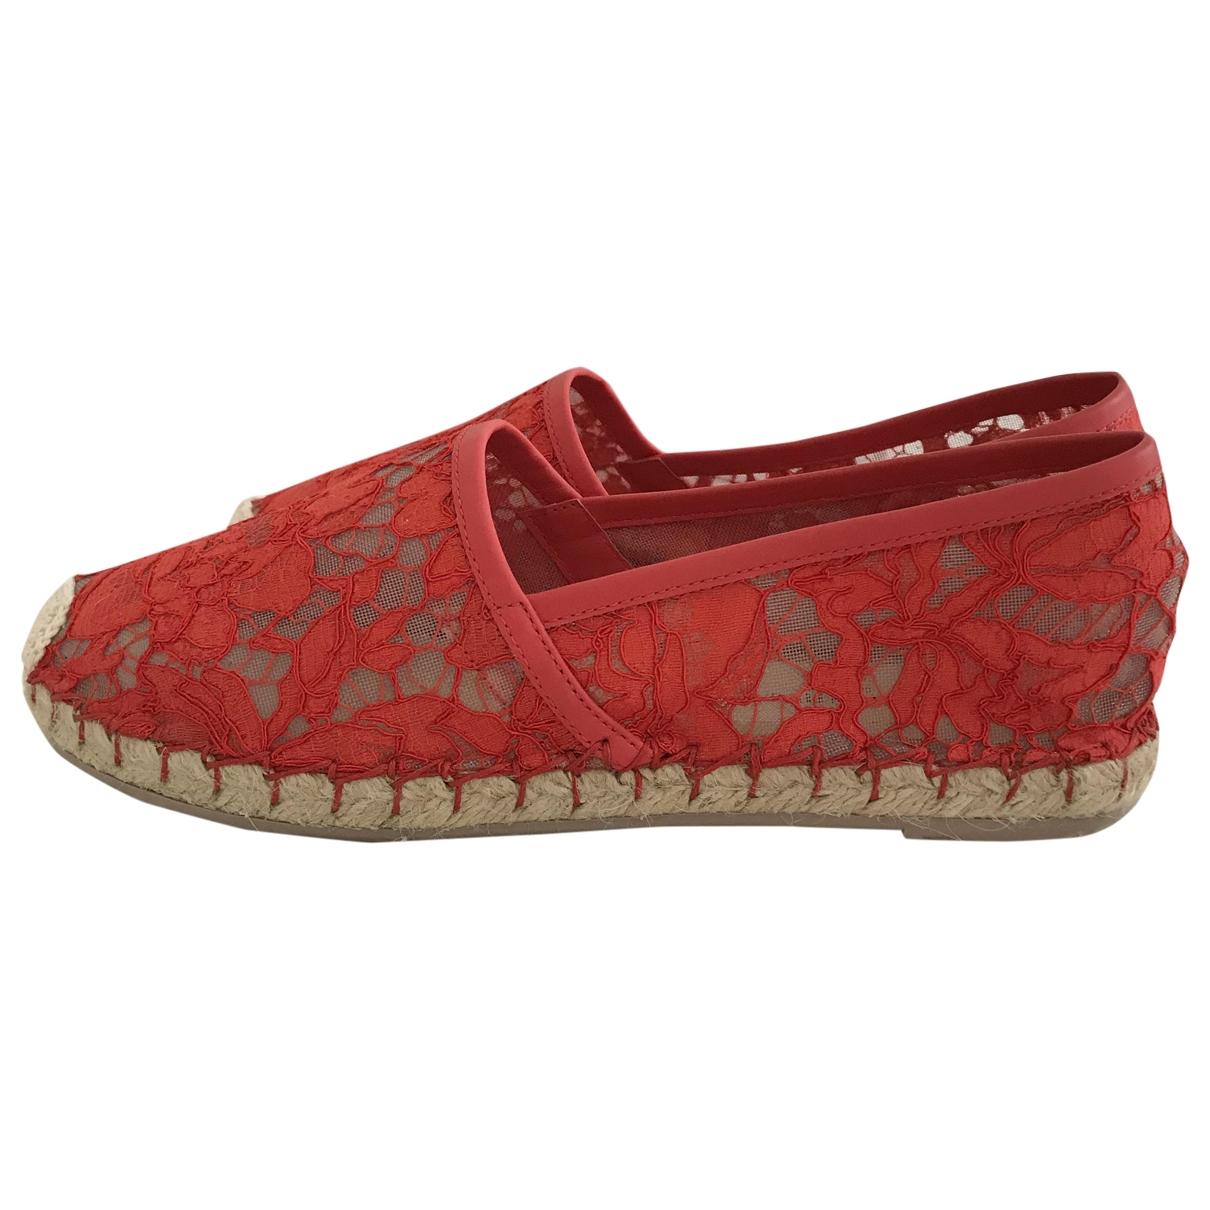 Valentino Garavani \N Red Cloth Espadrilles for Women 36 IT